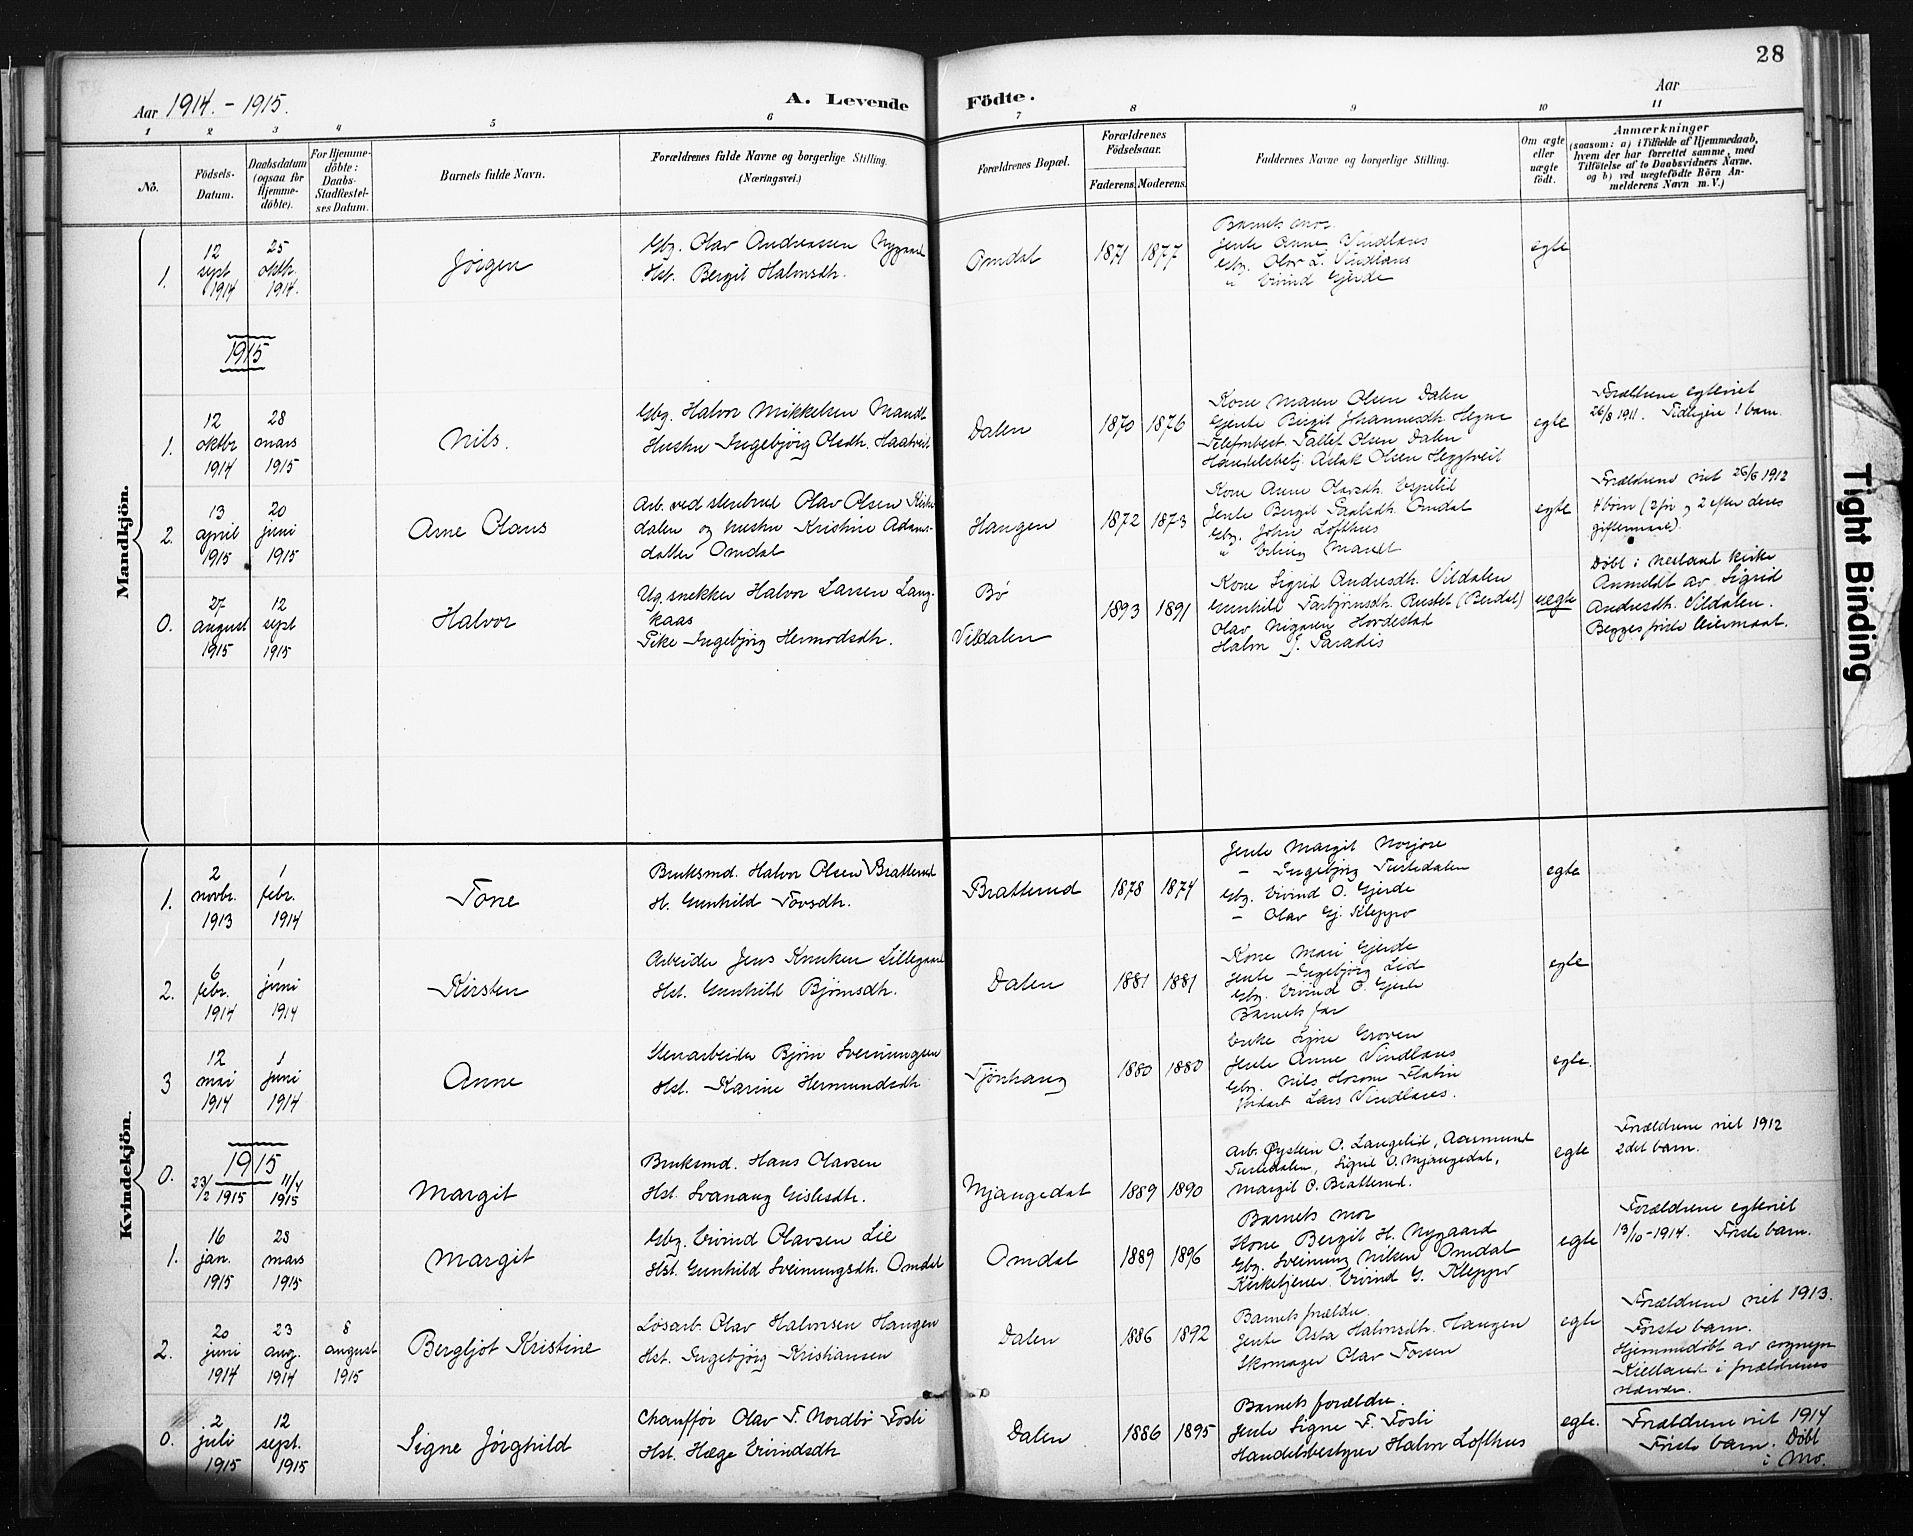 SAKO, Lårdal kirkebøker, F/Fb/L0002: Ministerialbok nr. II 2, 1887-1918, s. 28